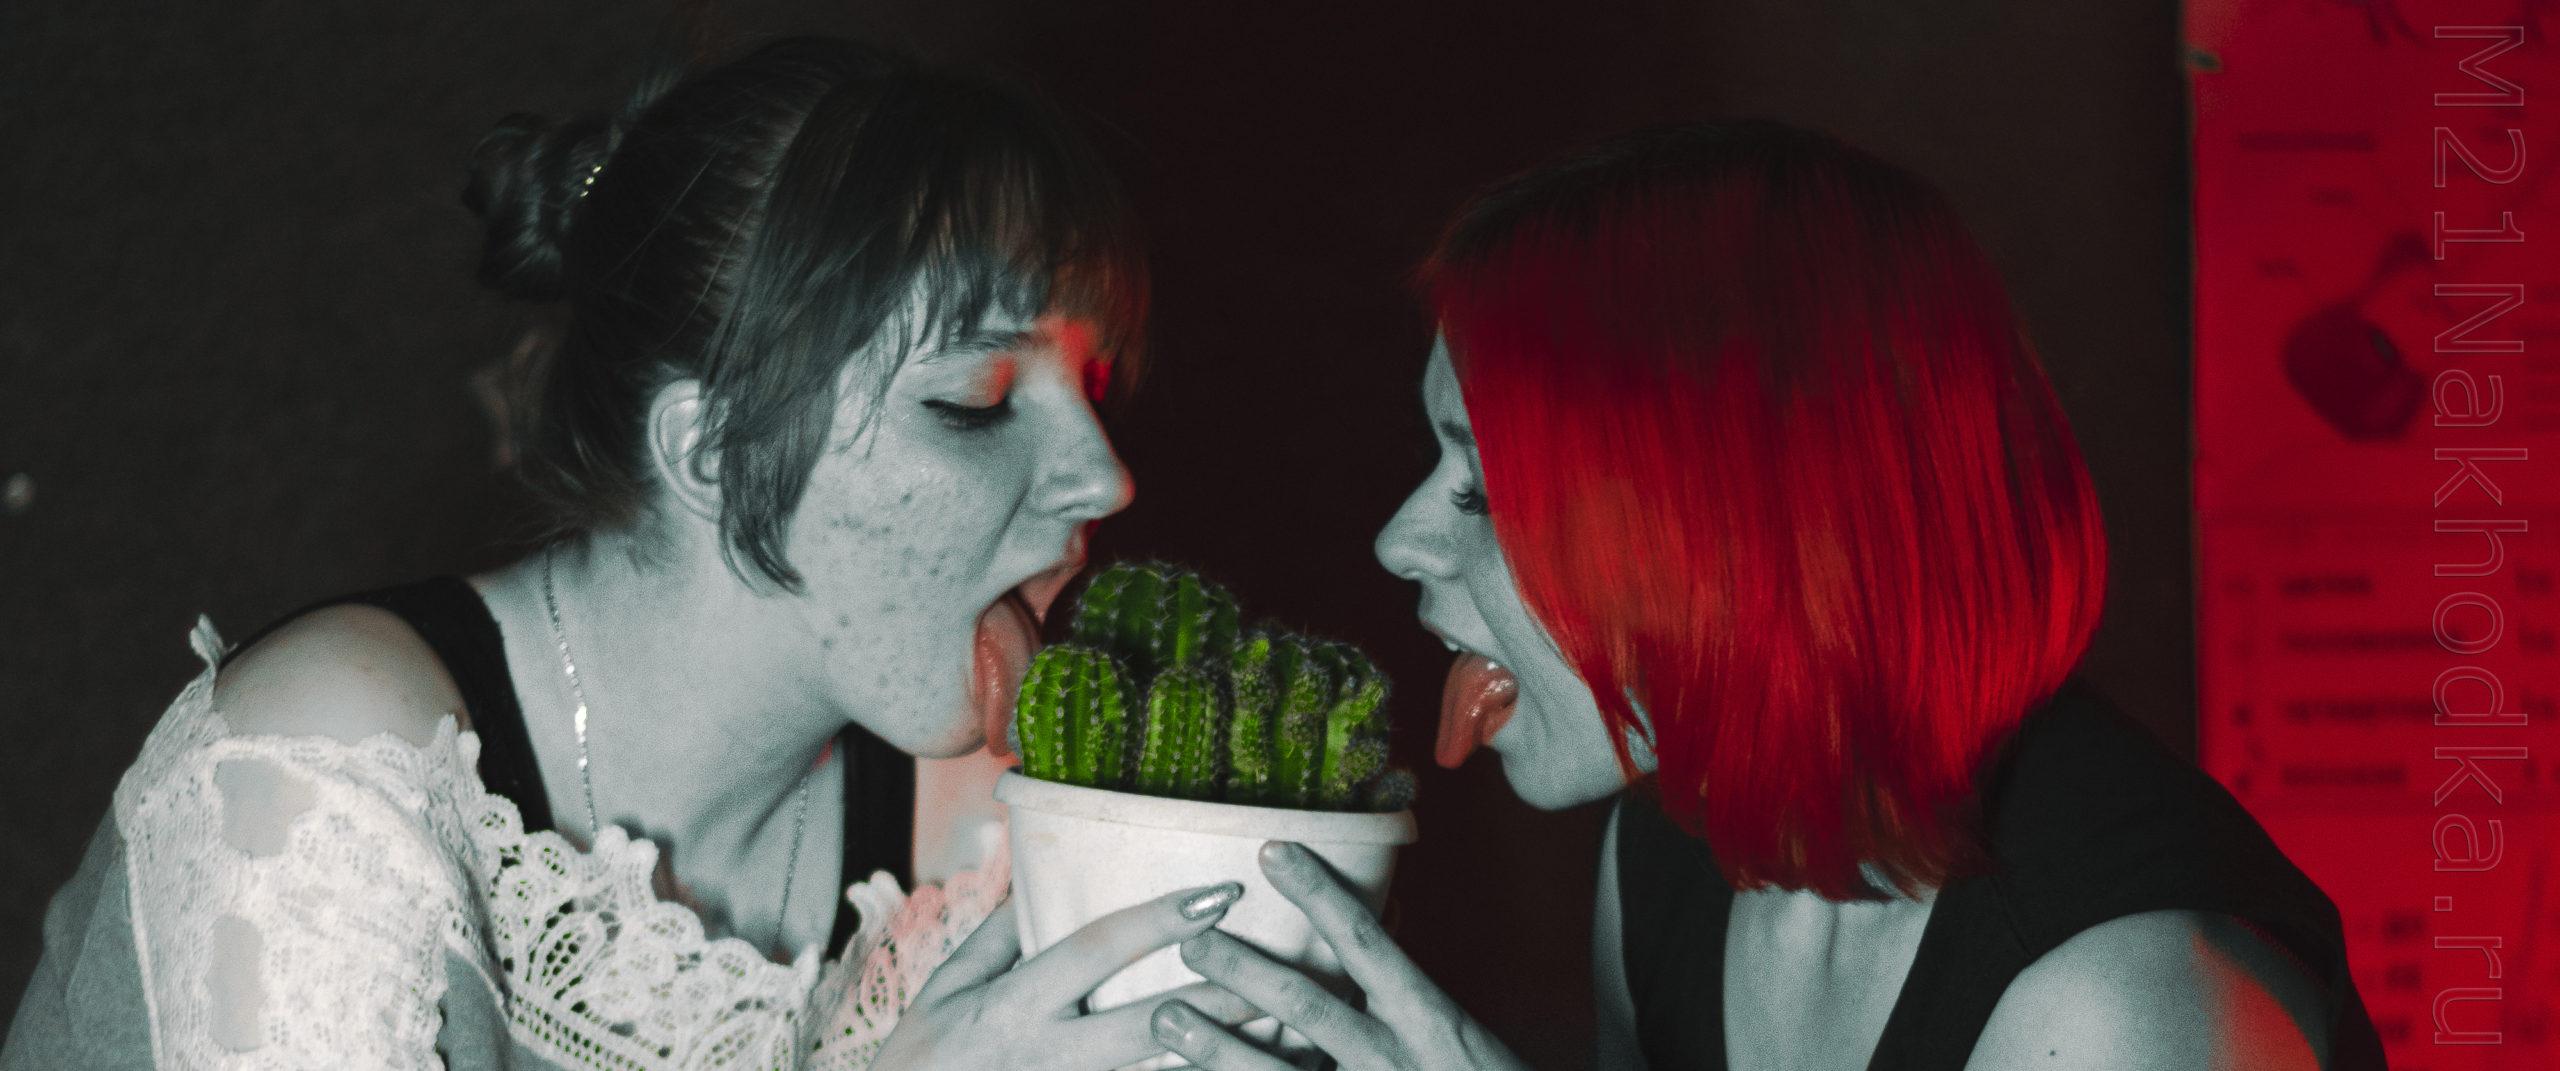 Анастасия и Маргарита, девушки месяца, thumb